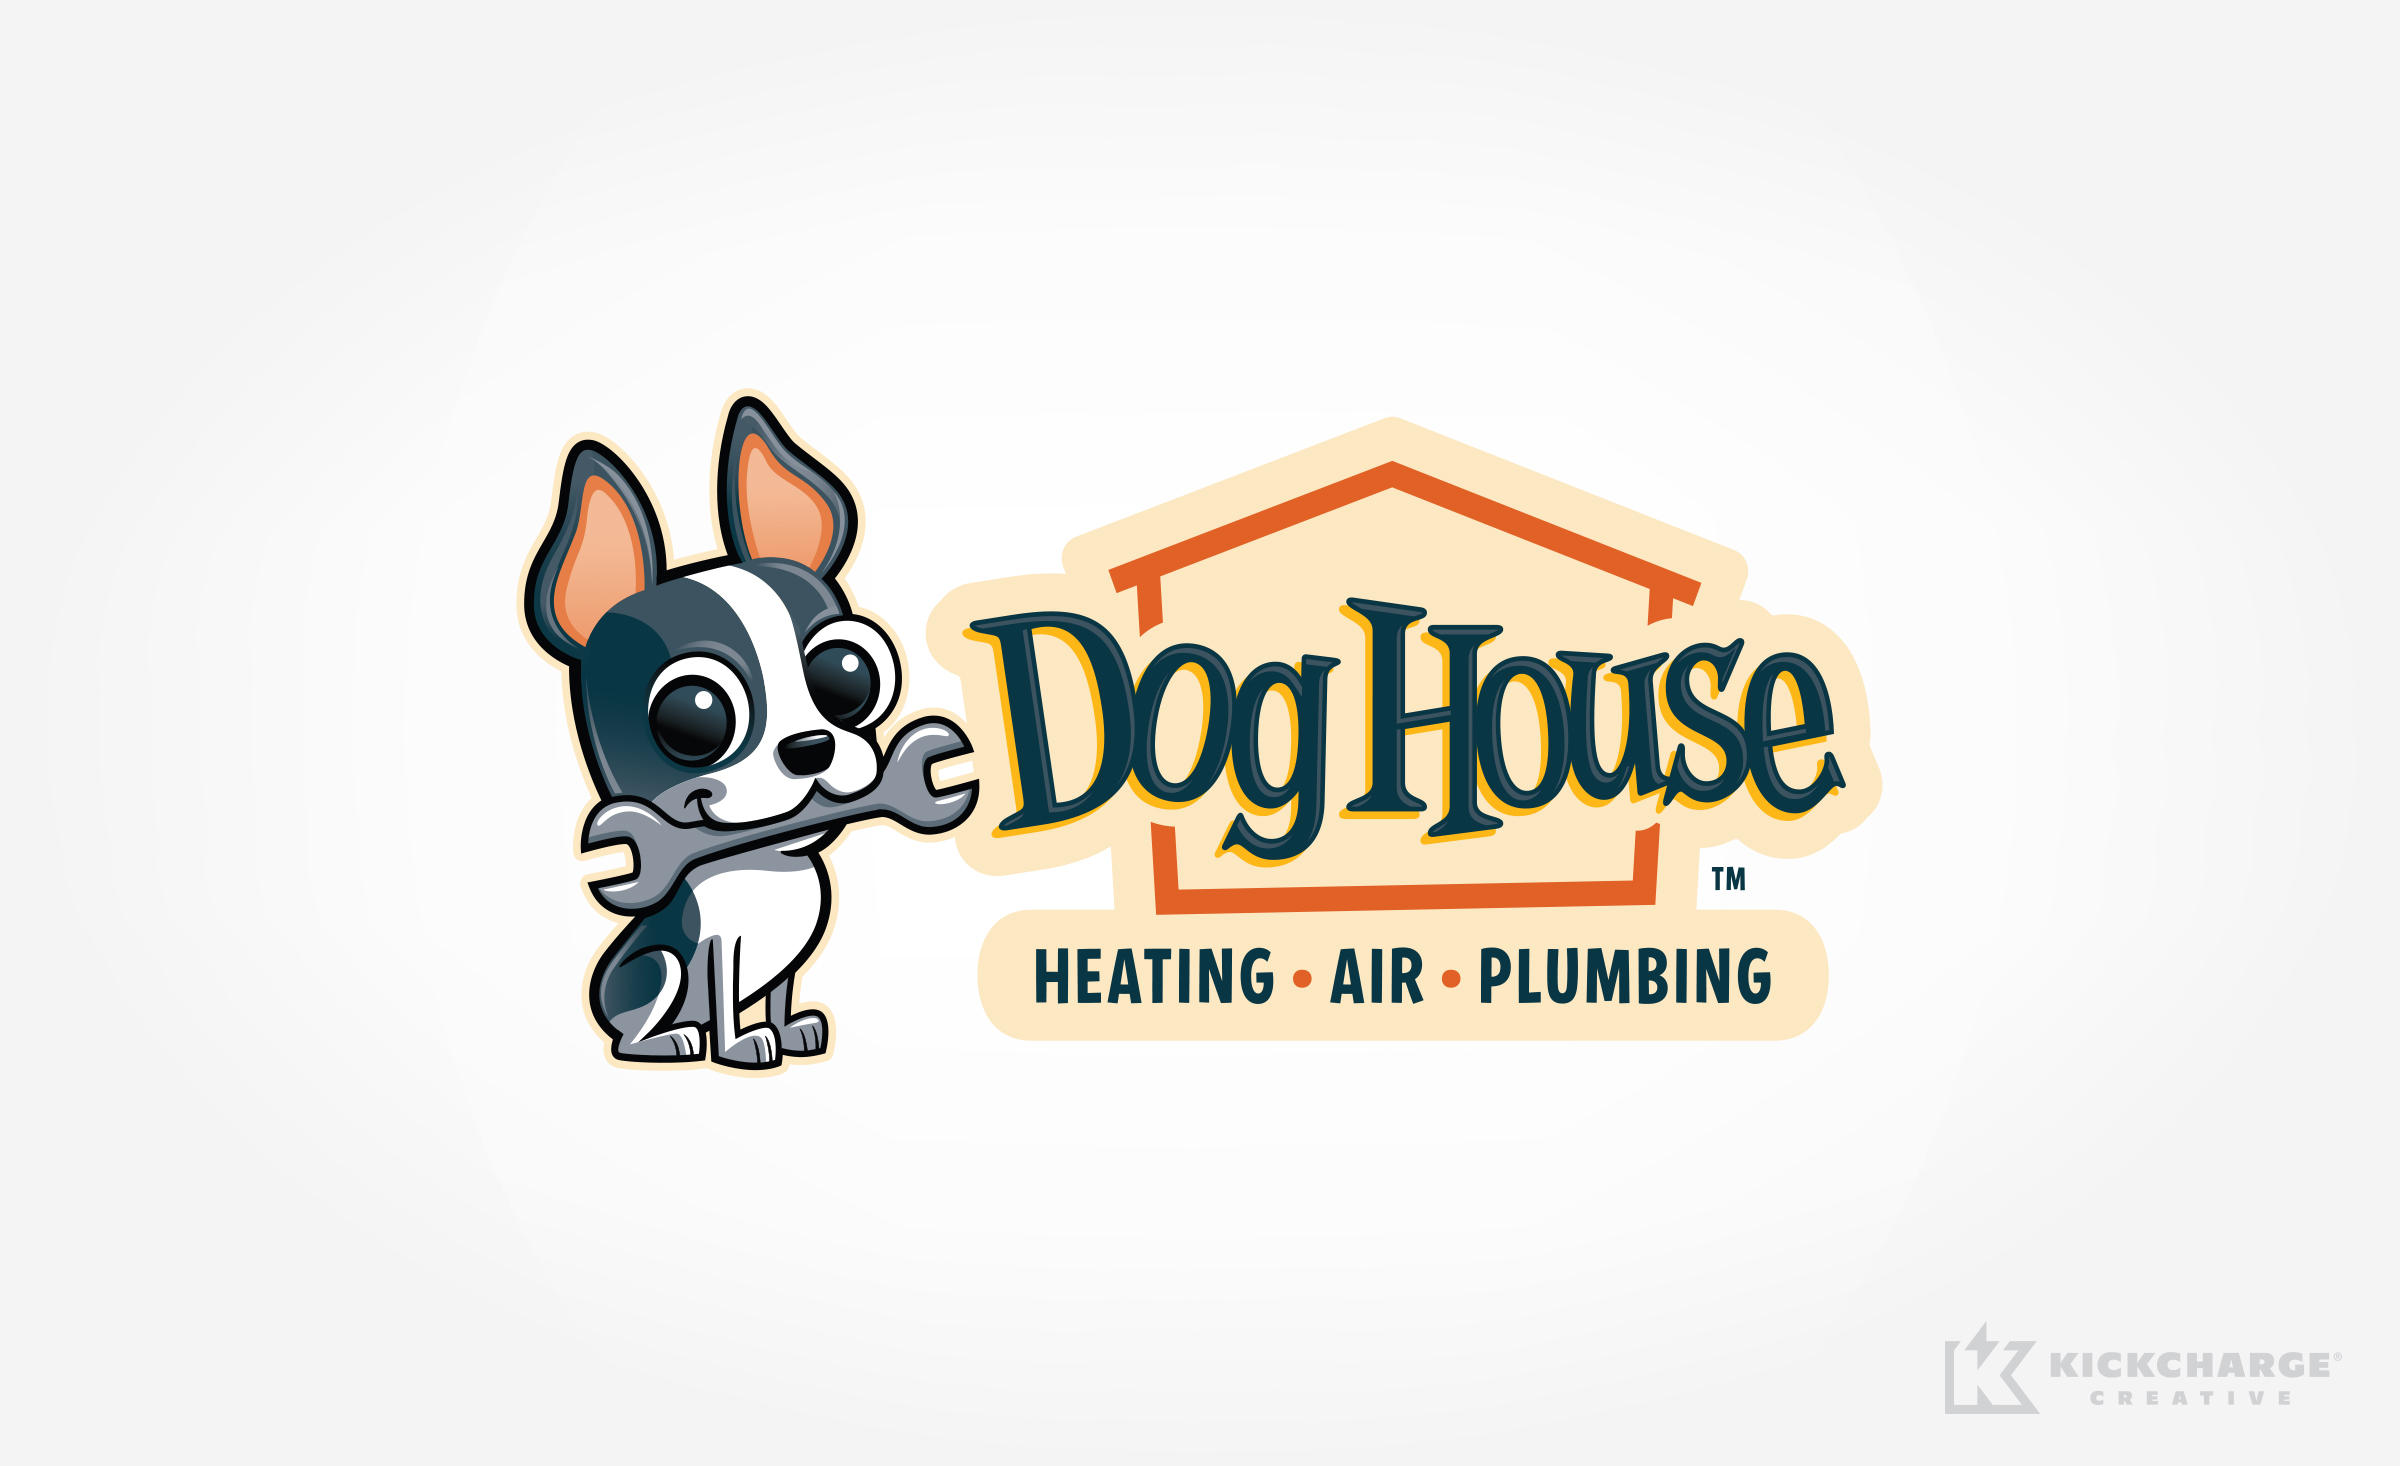 hvac logo for Dog House